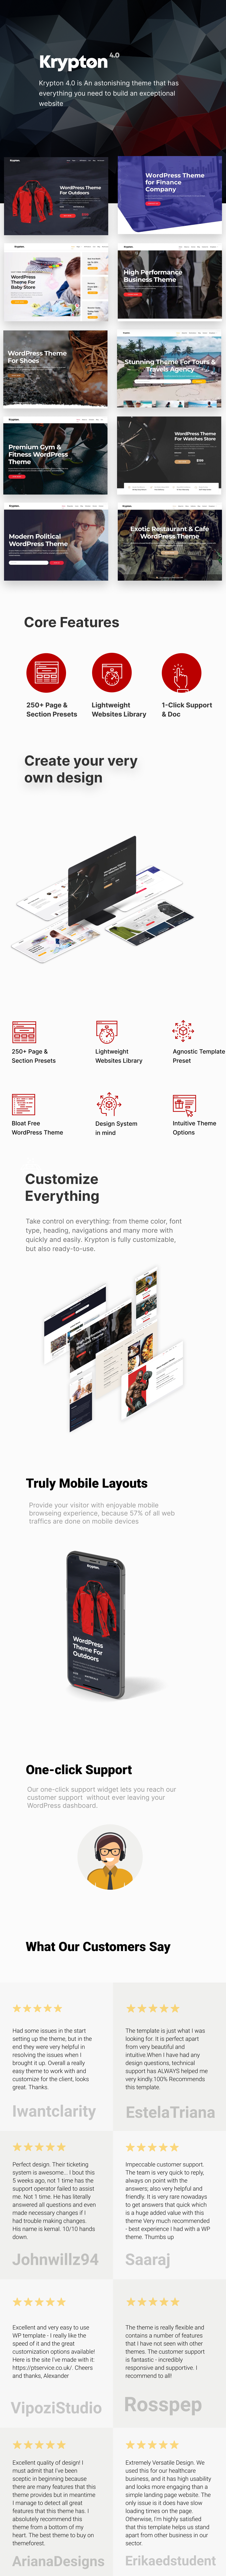 Krypton - Responsive Multipurpose WordPress Theme - 1